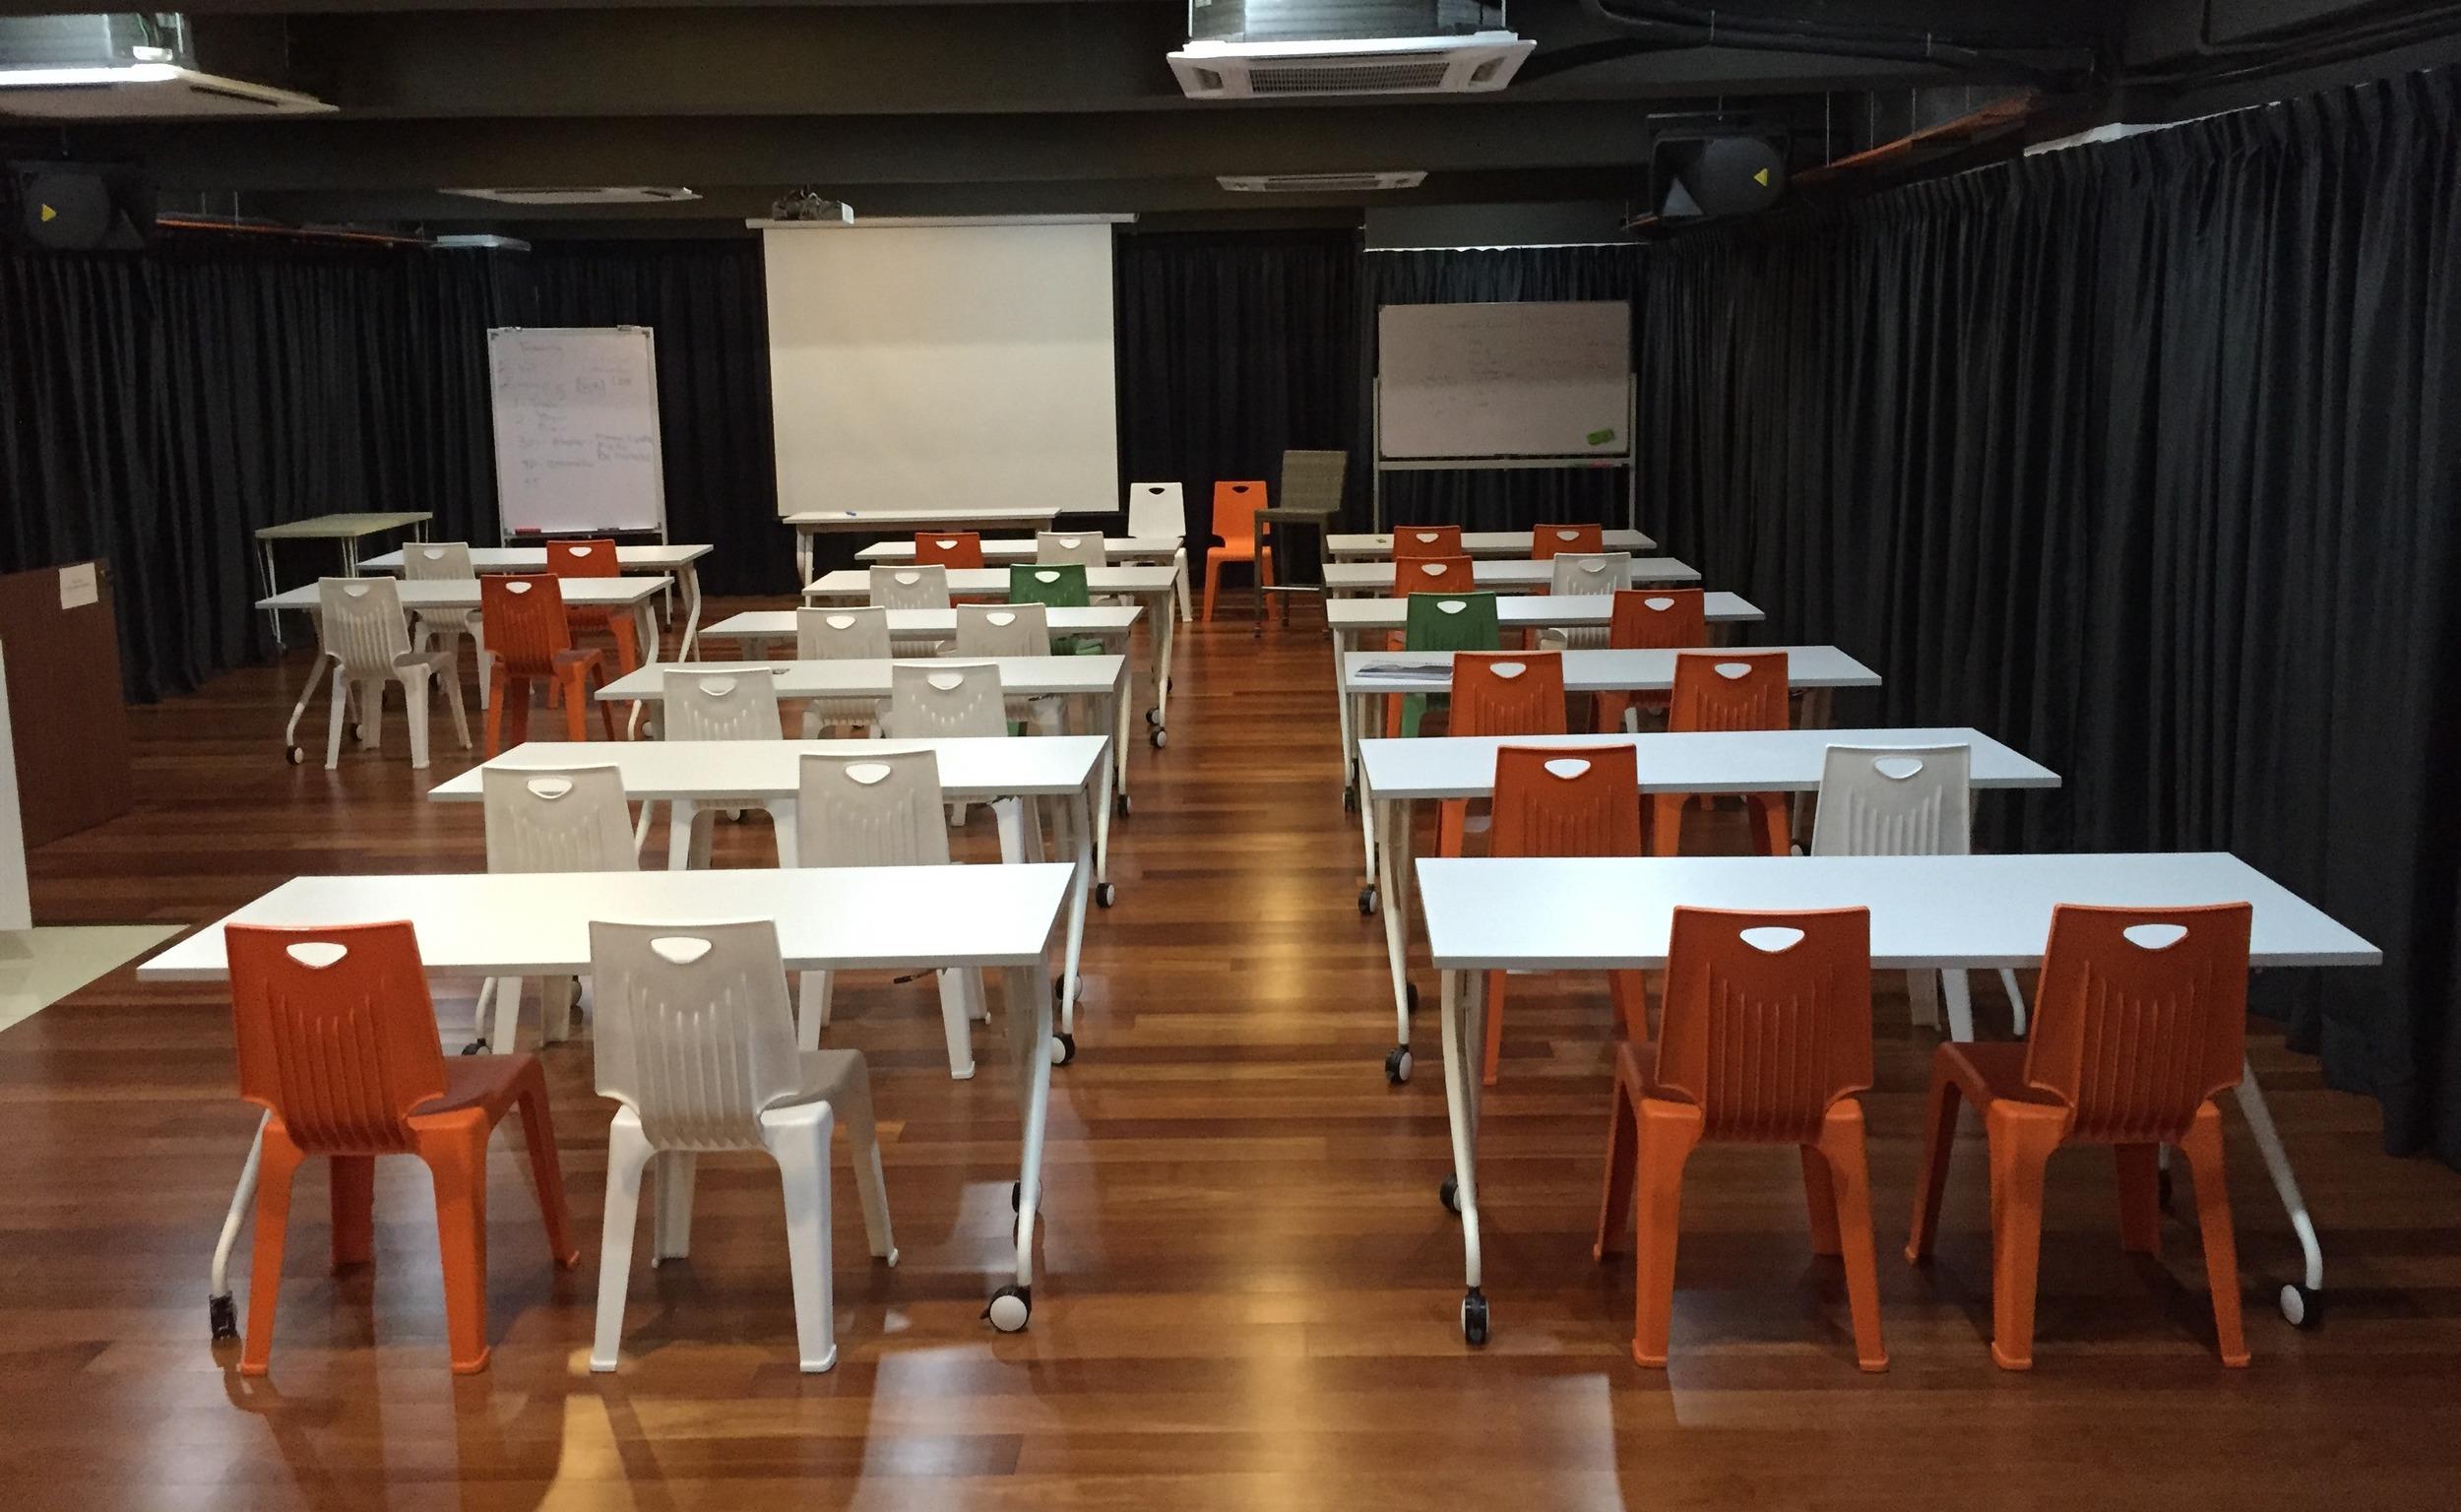 HarmonyHallPJ_Classroom Style_2.jpg